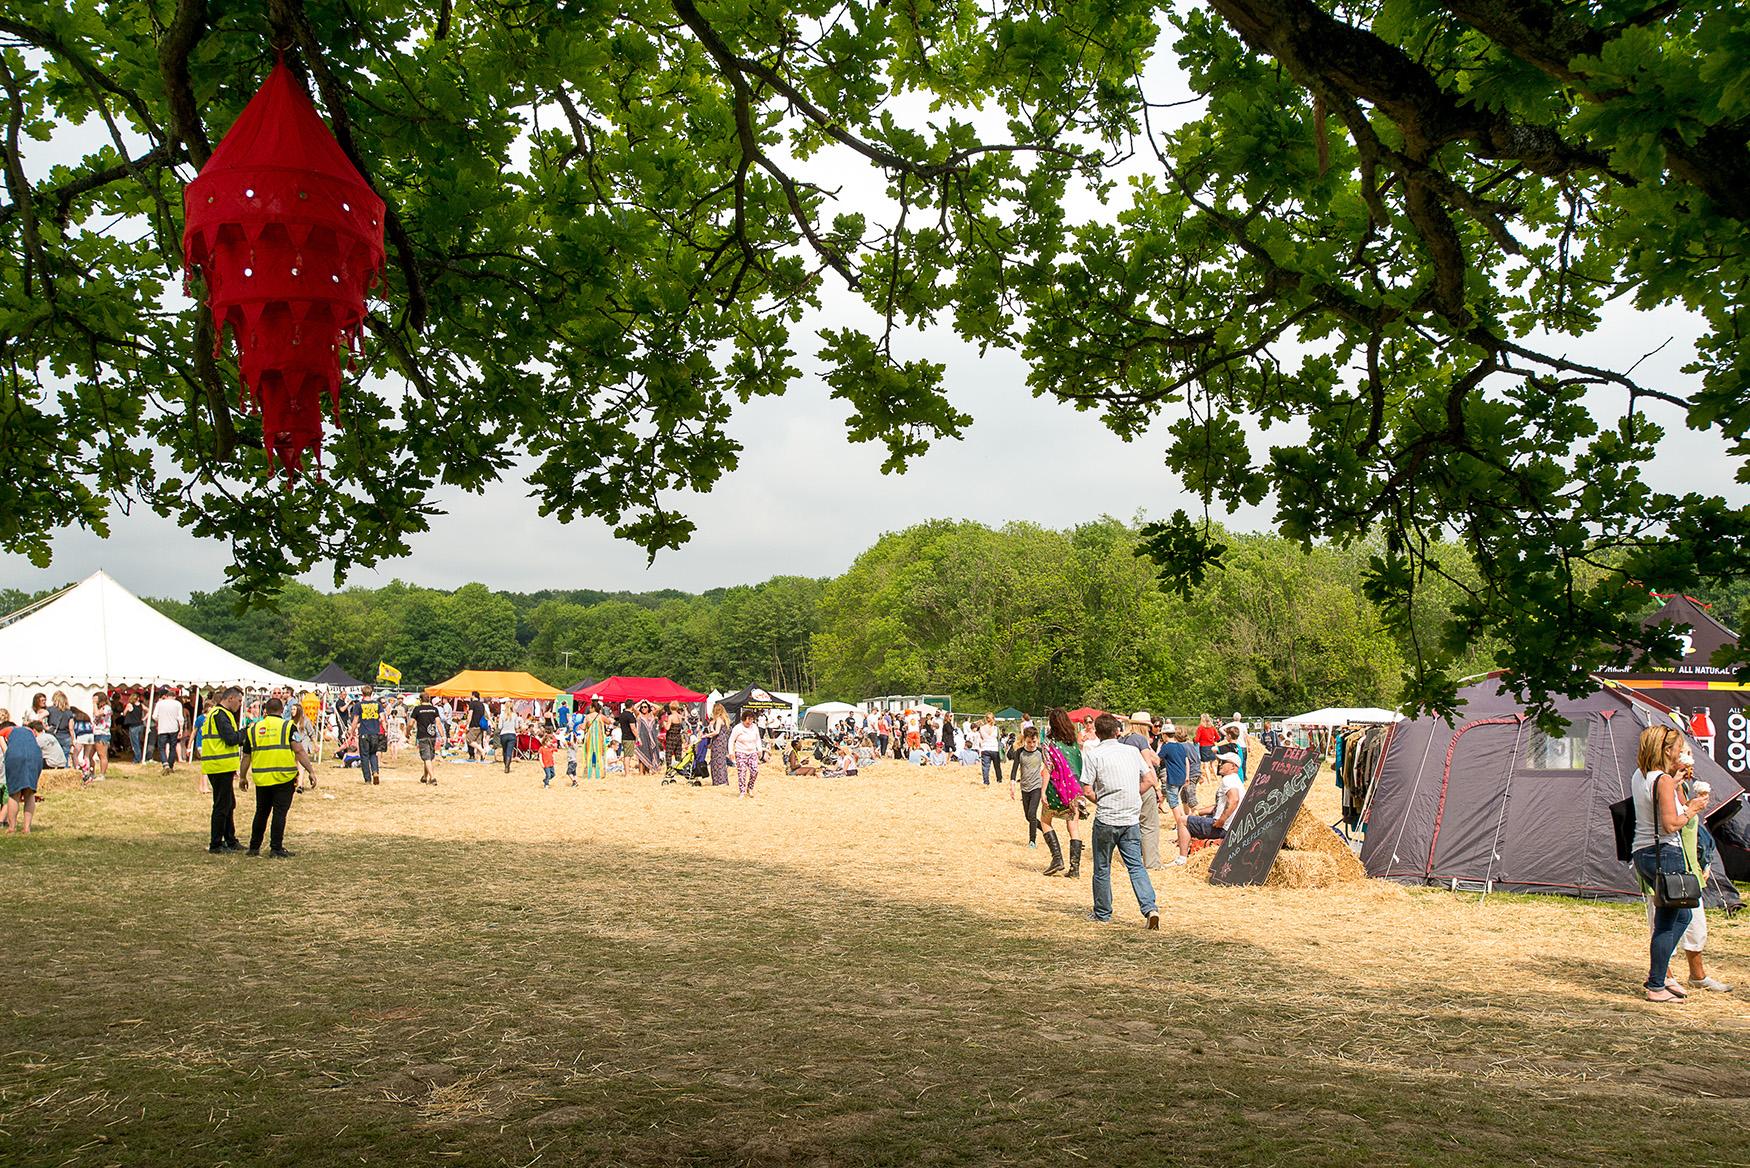 Al-Fresco Festival in Tunbridge Wells - photo by David Hodgkinson